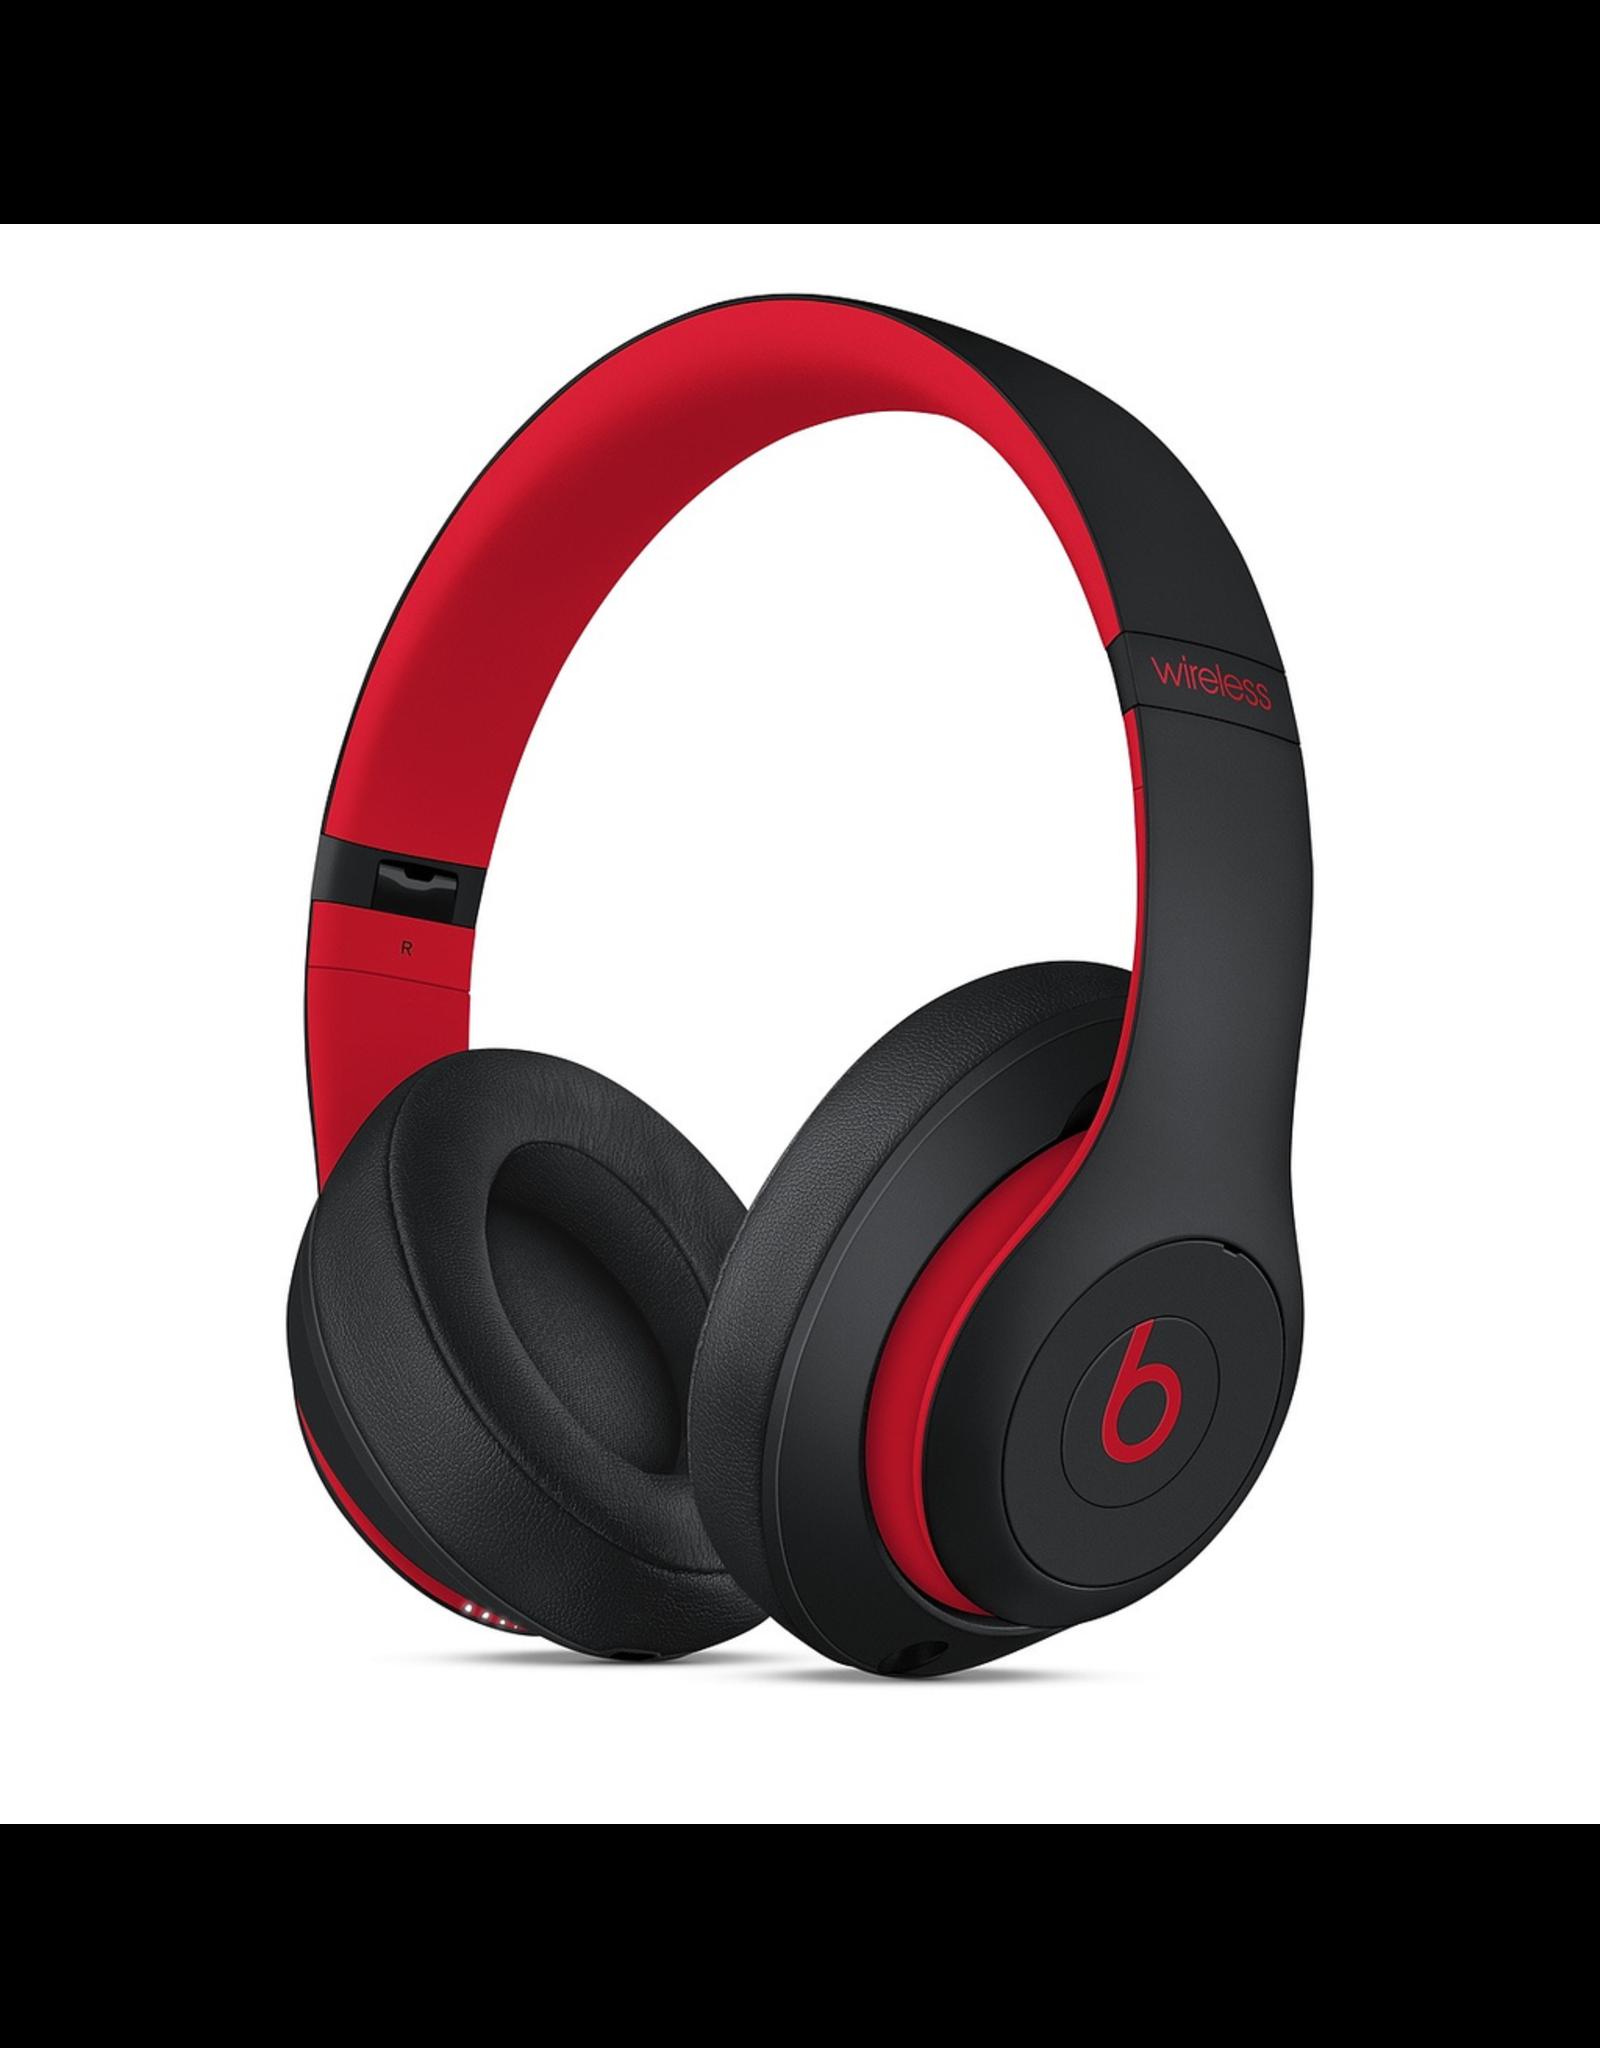 Beats Beats Studio3 Wireless Over-Ear Headphones - Decade Collection - Defiant Black-Red